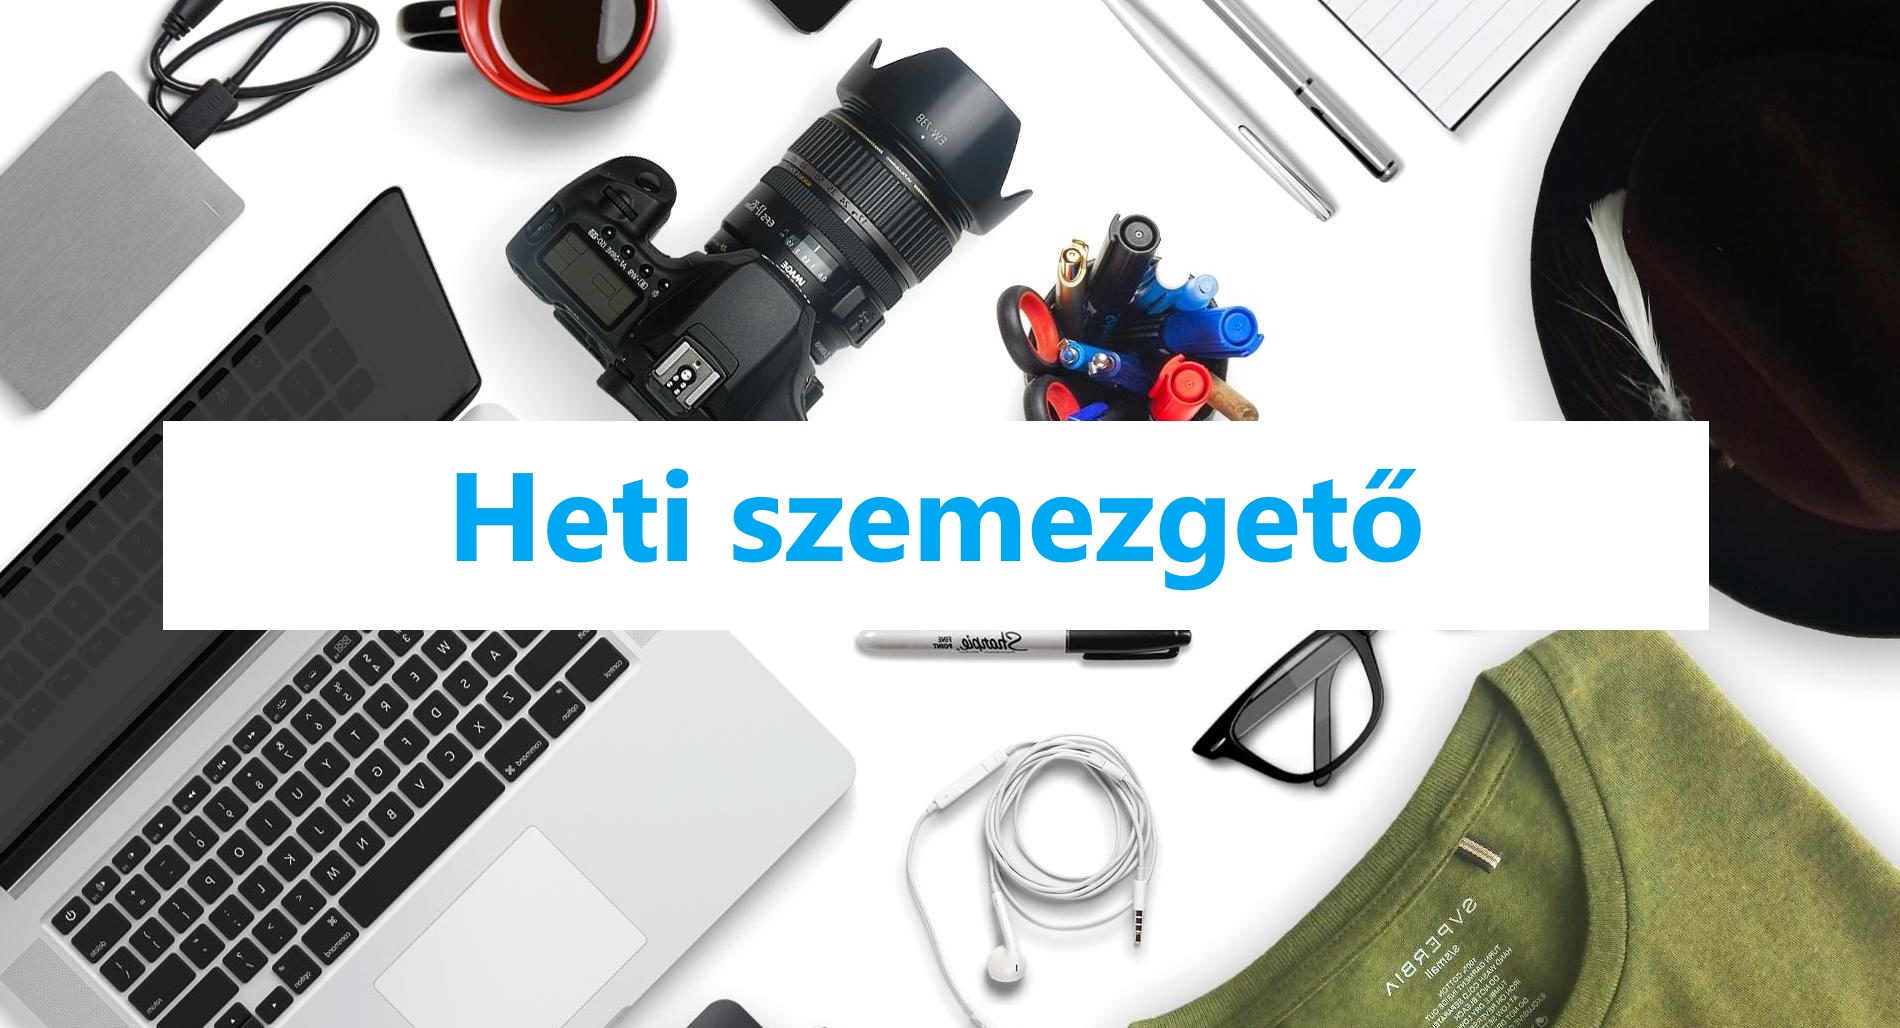 heti_szemezgeto_uj_81.jpg